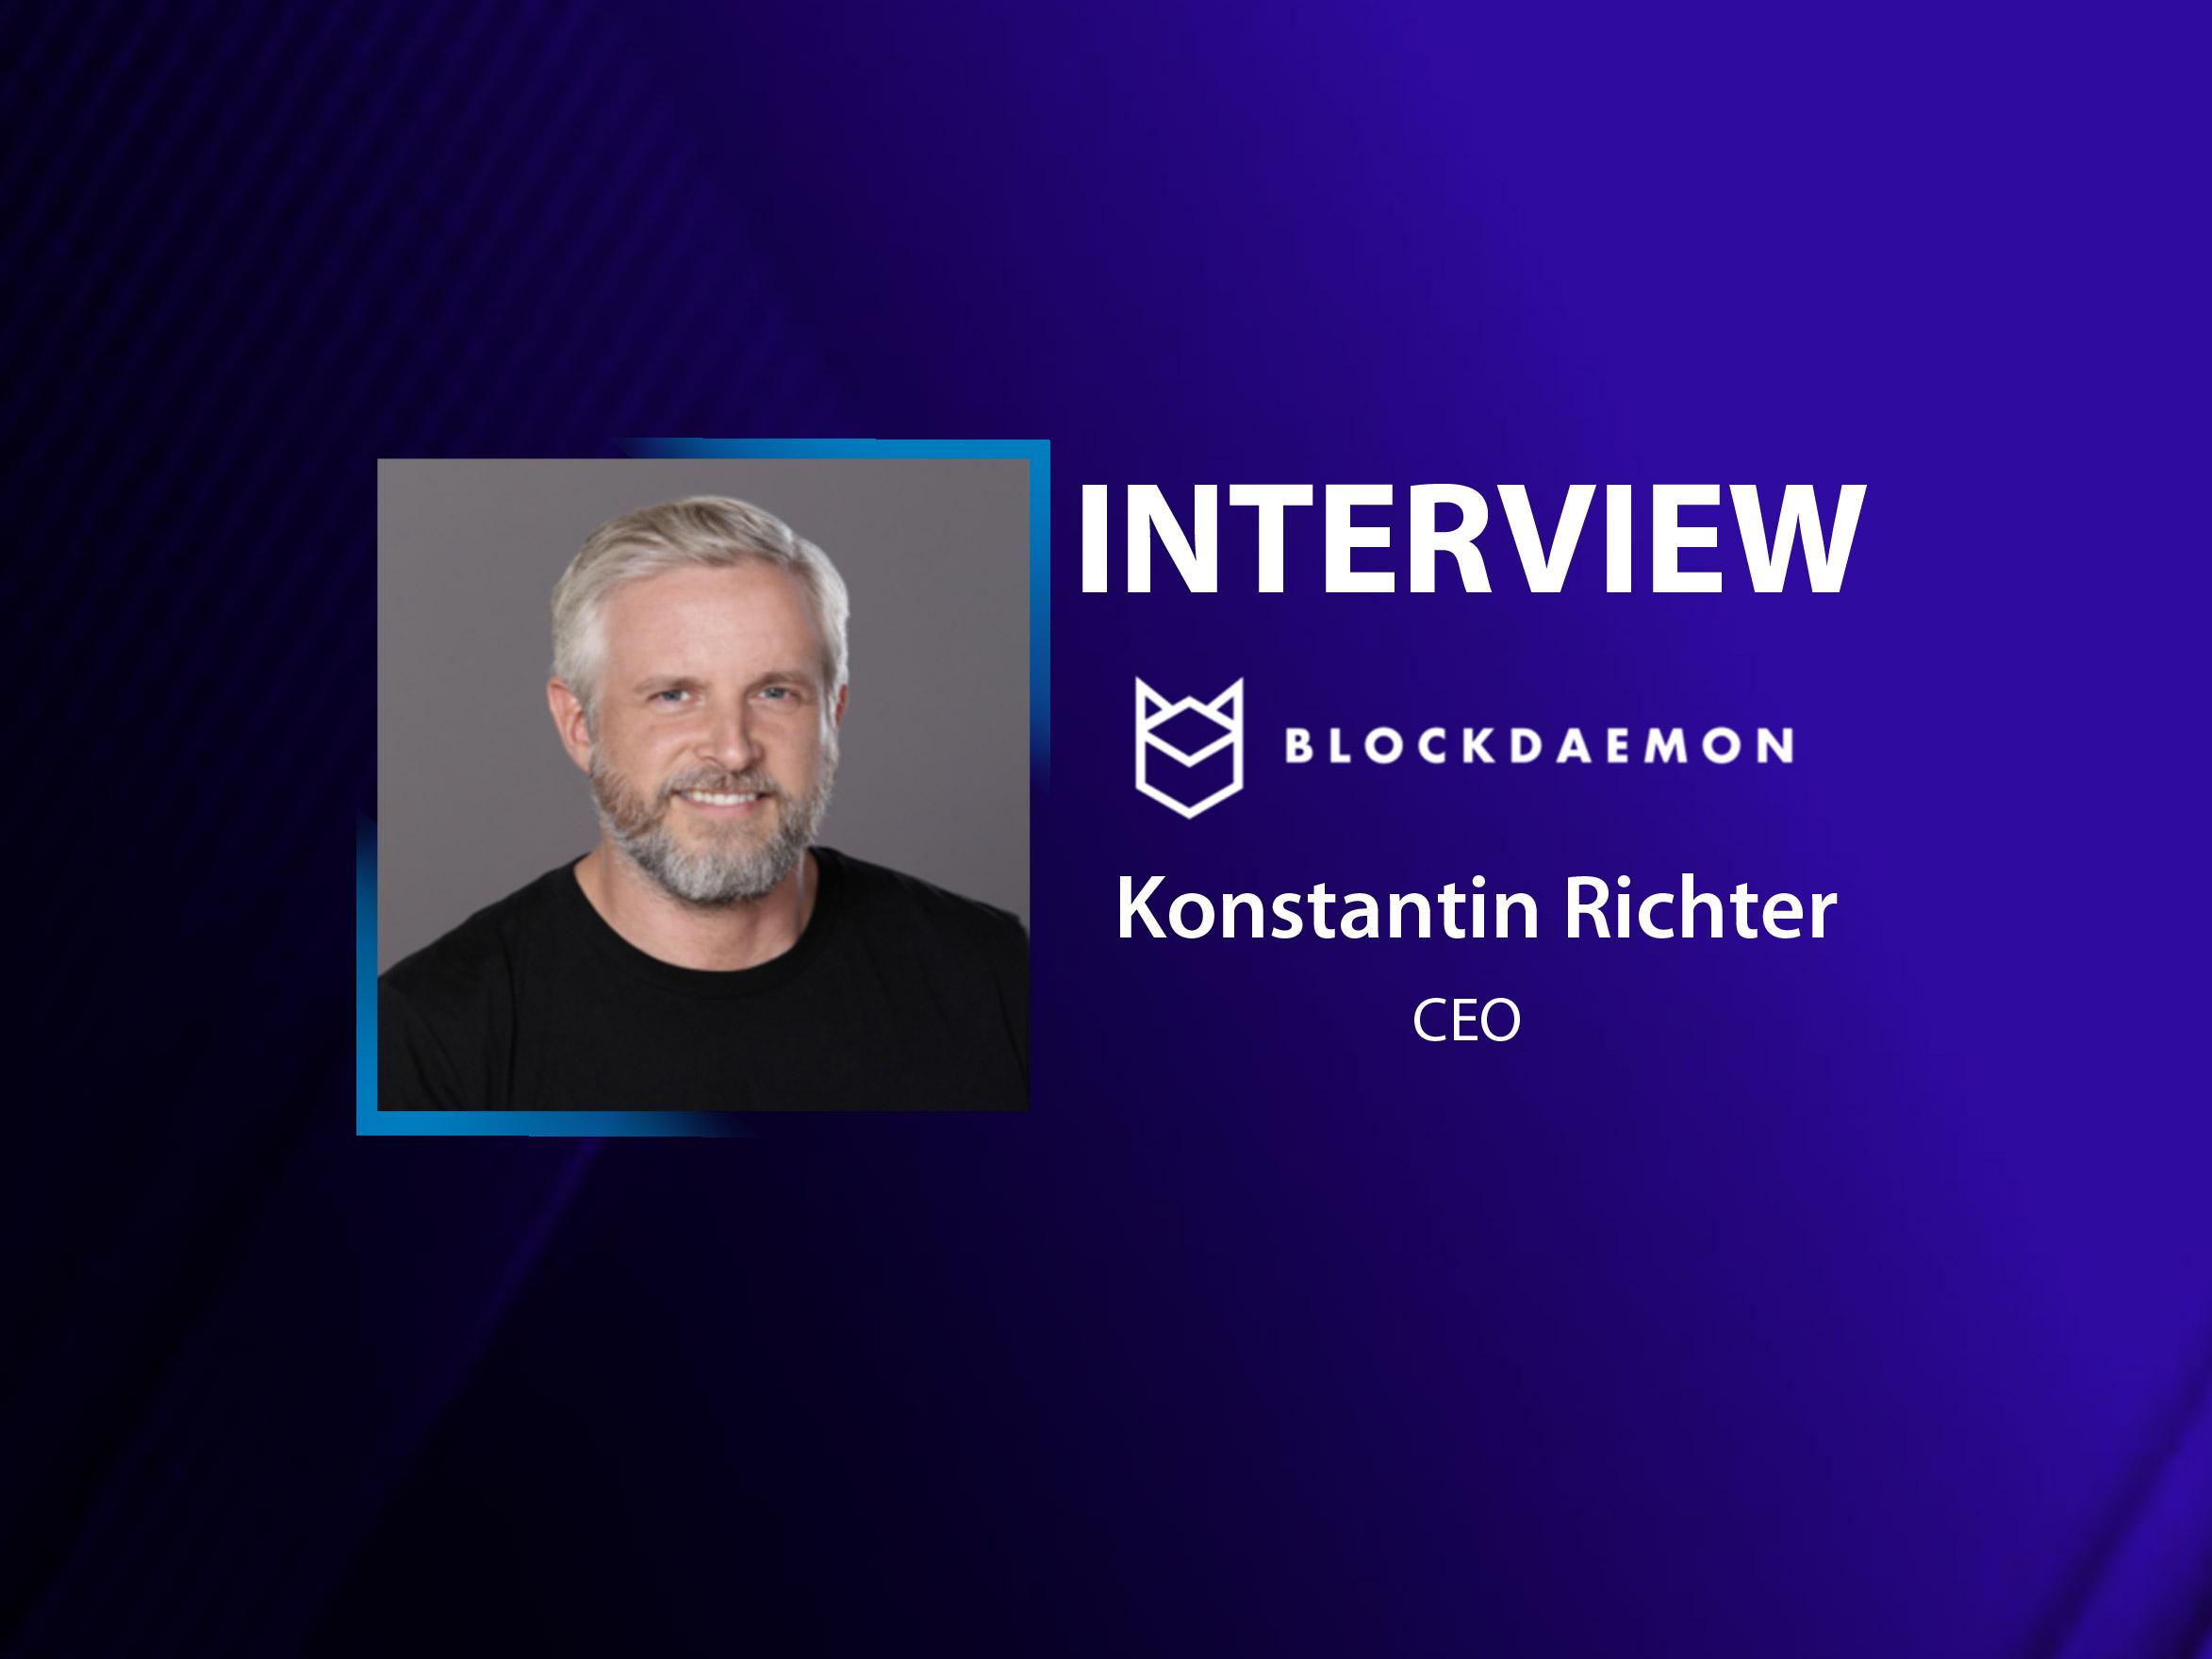 GlobalFintechSeries Interview with Konstantin Richter, CEO & Founder of Blockdaemon